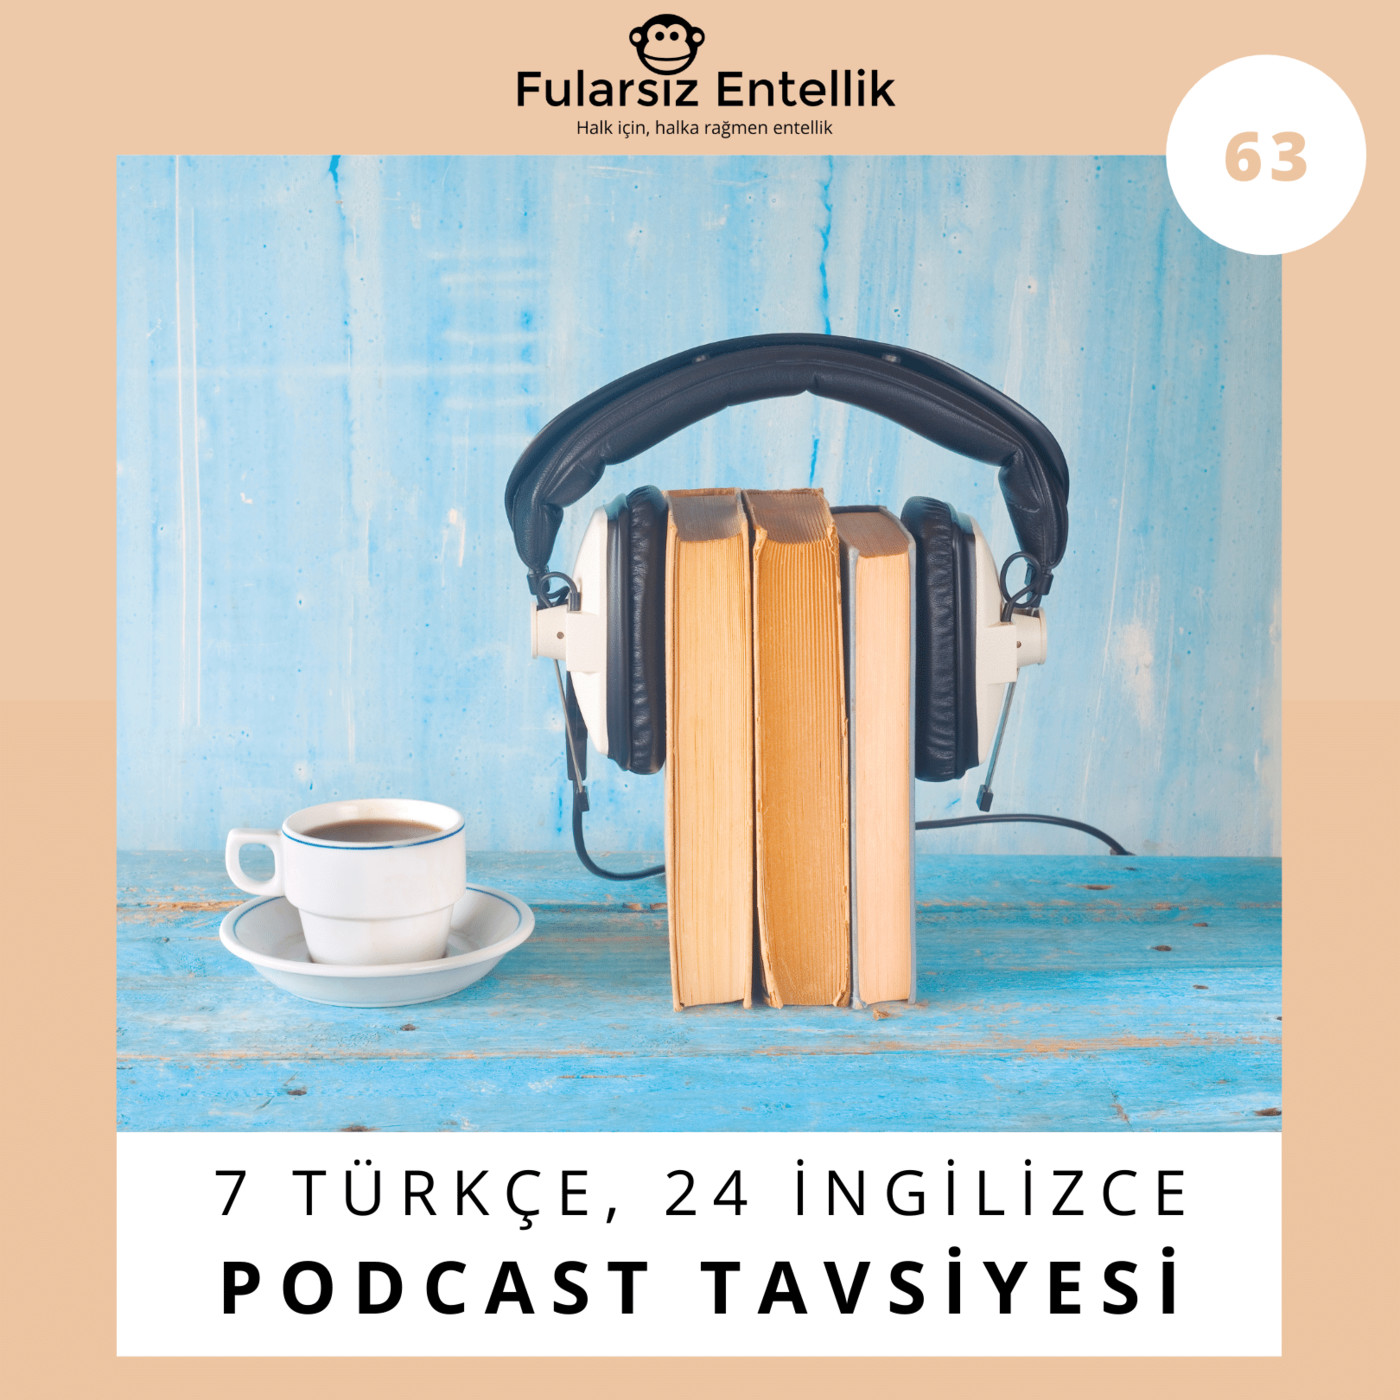 7/24 Podcast: 7 Türkçe, 24 İngilizce Podcast Tavsiyesi